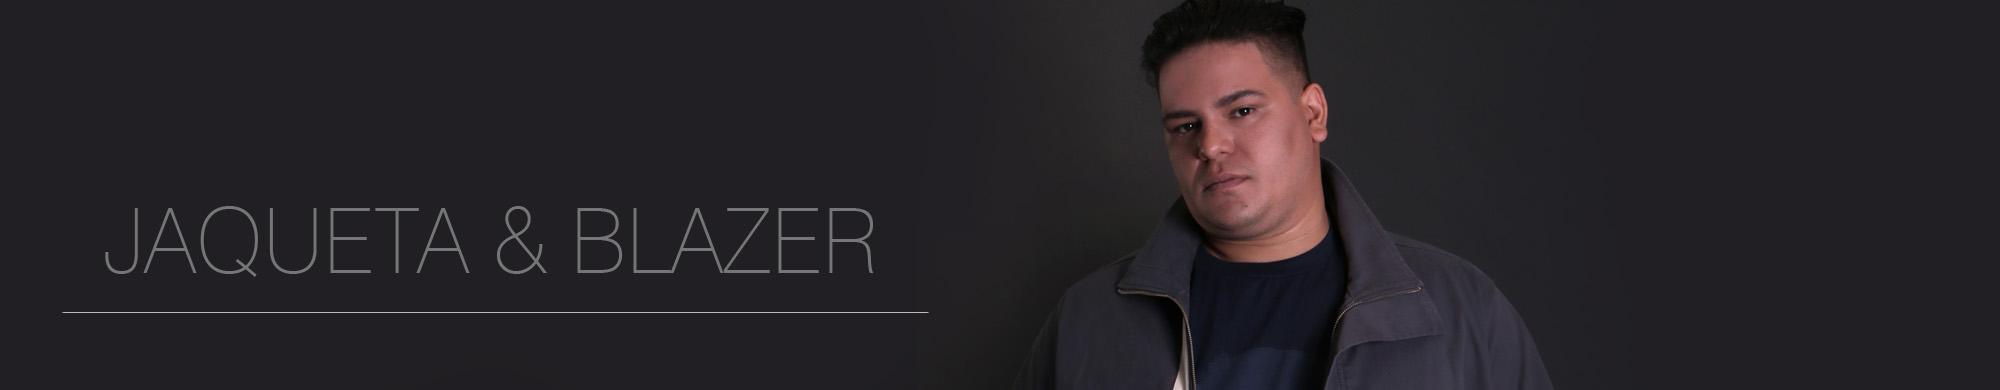 banner-jaquetasblazer-masc